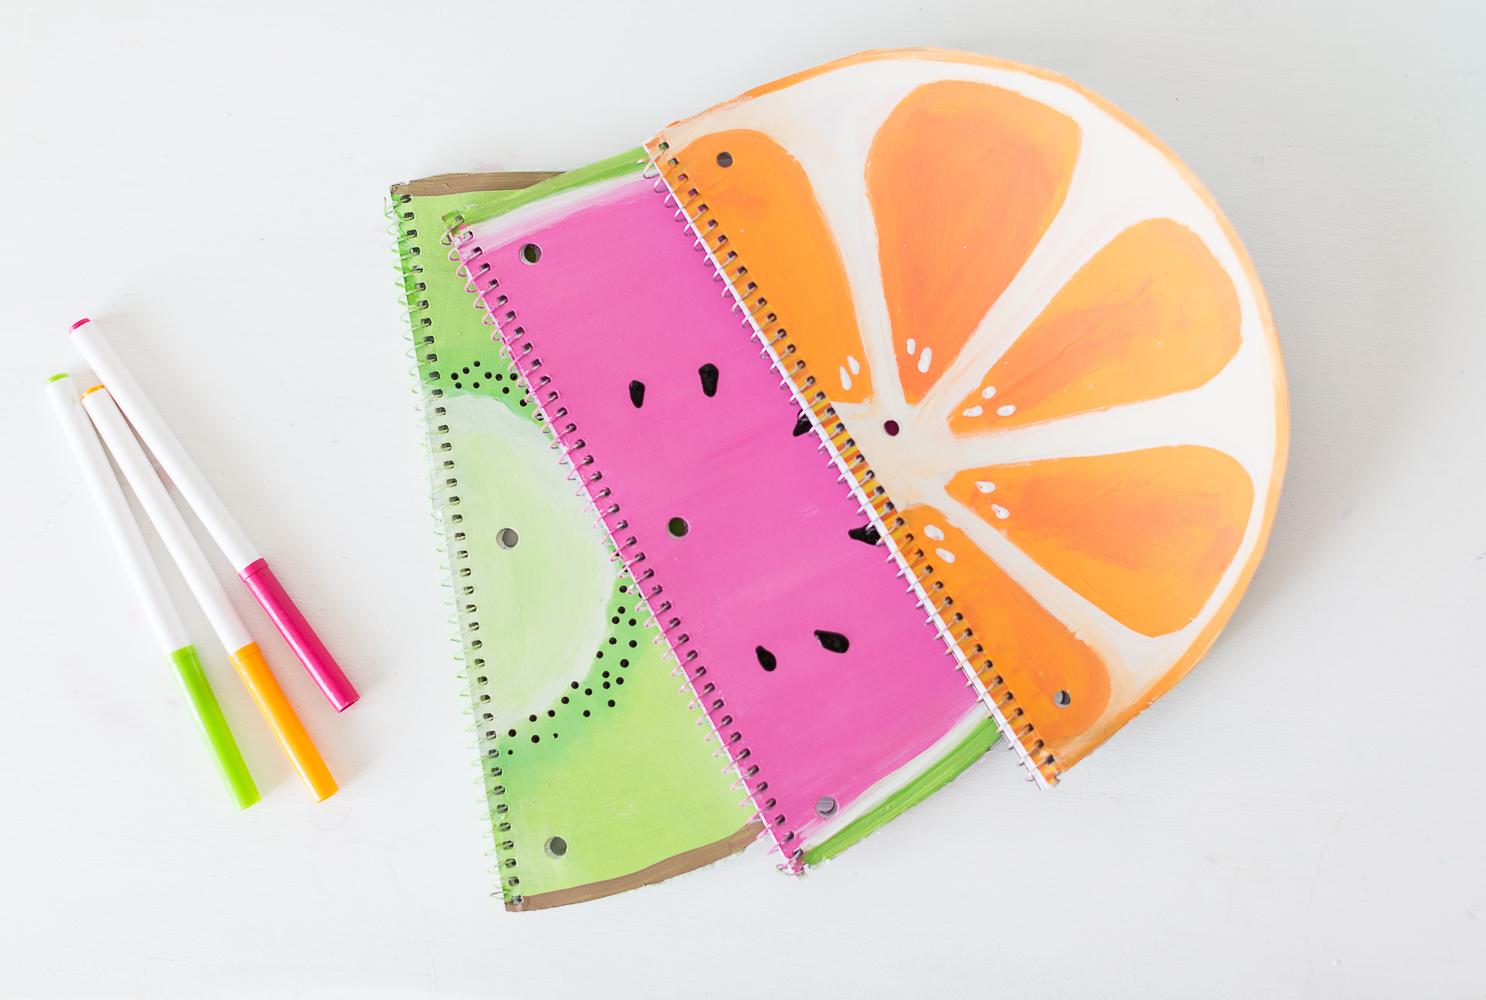 fruitnotebooksdiycraftberrybush-3